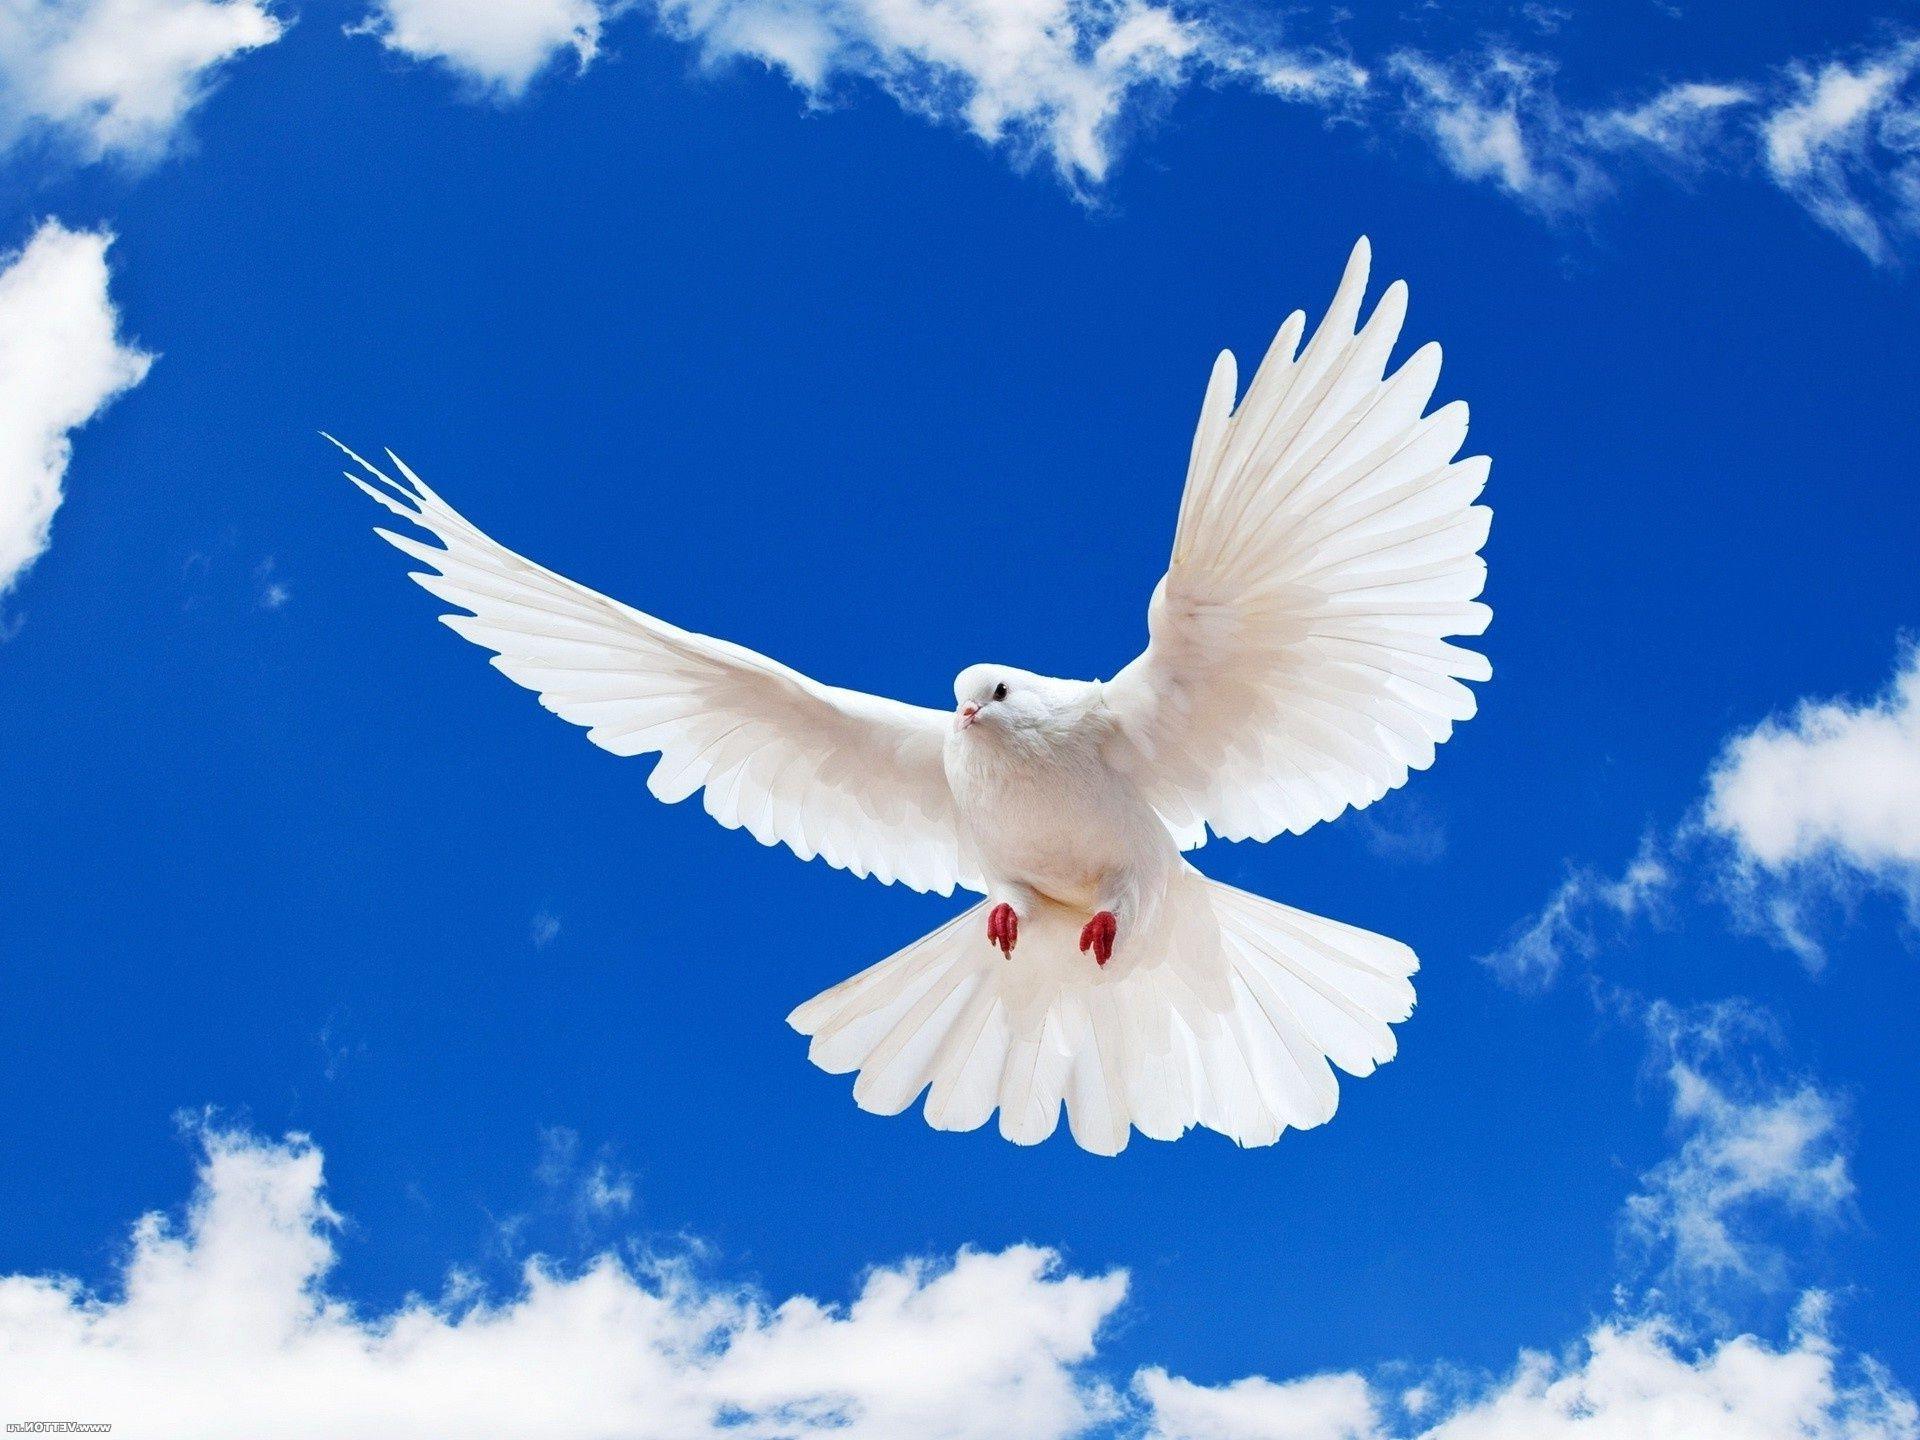 фото миру мир